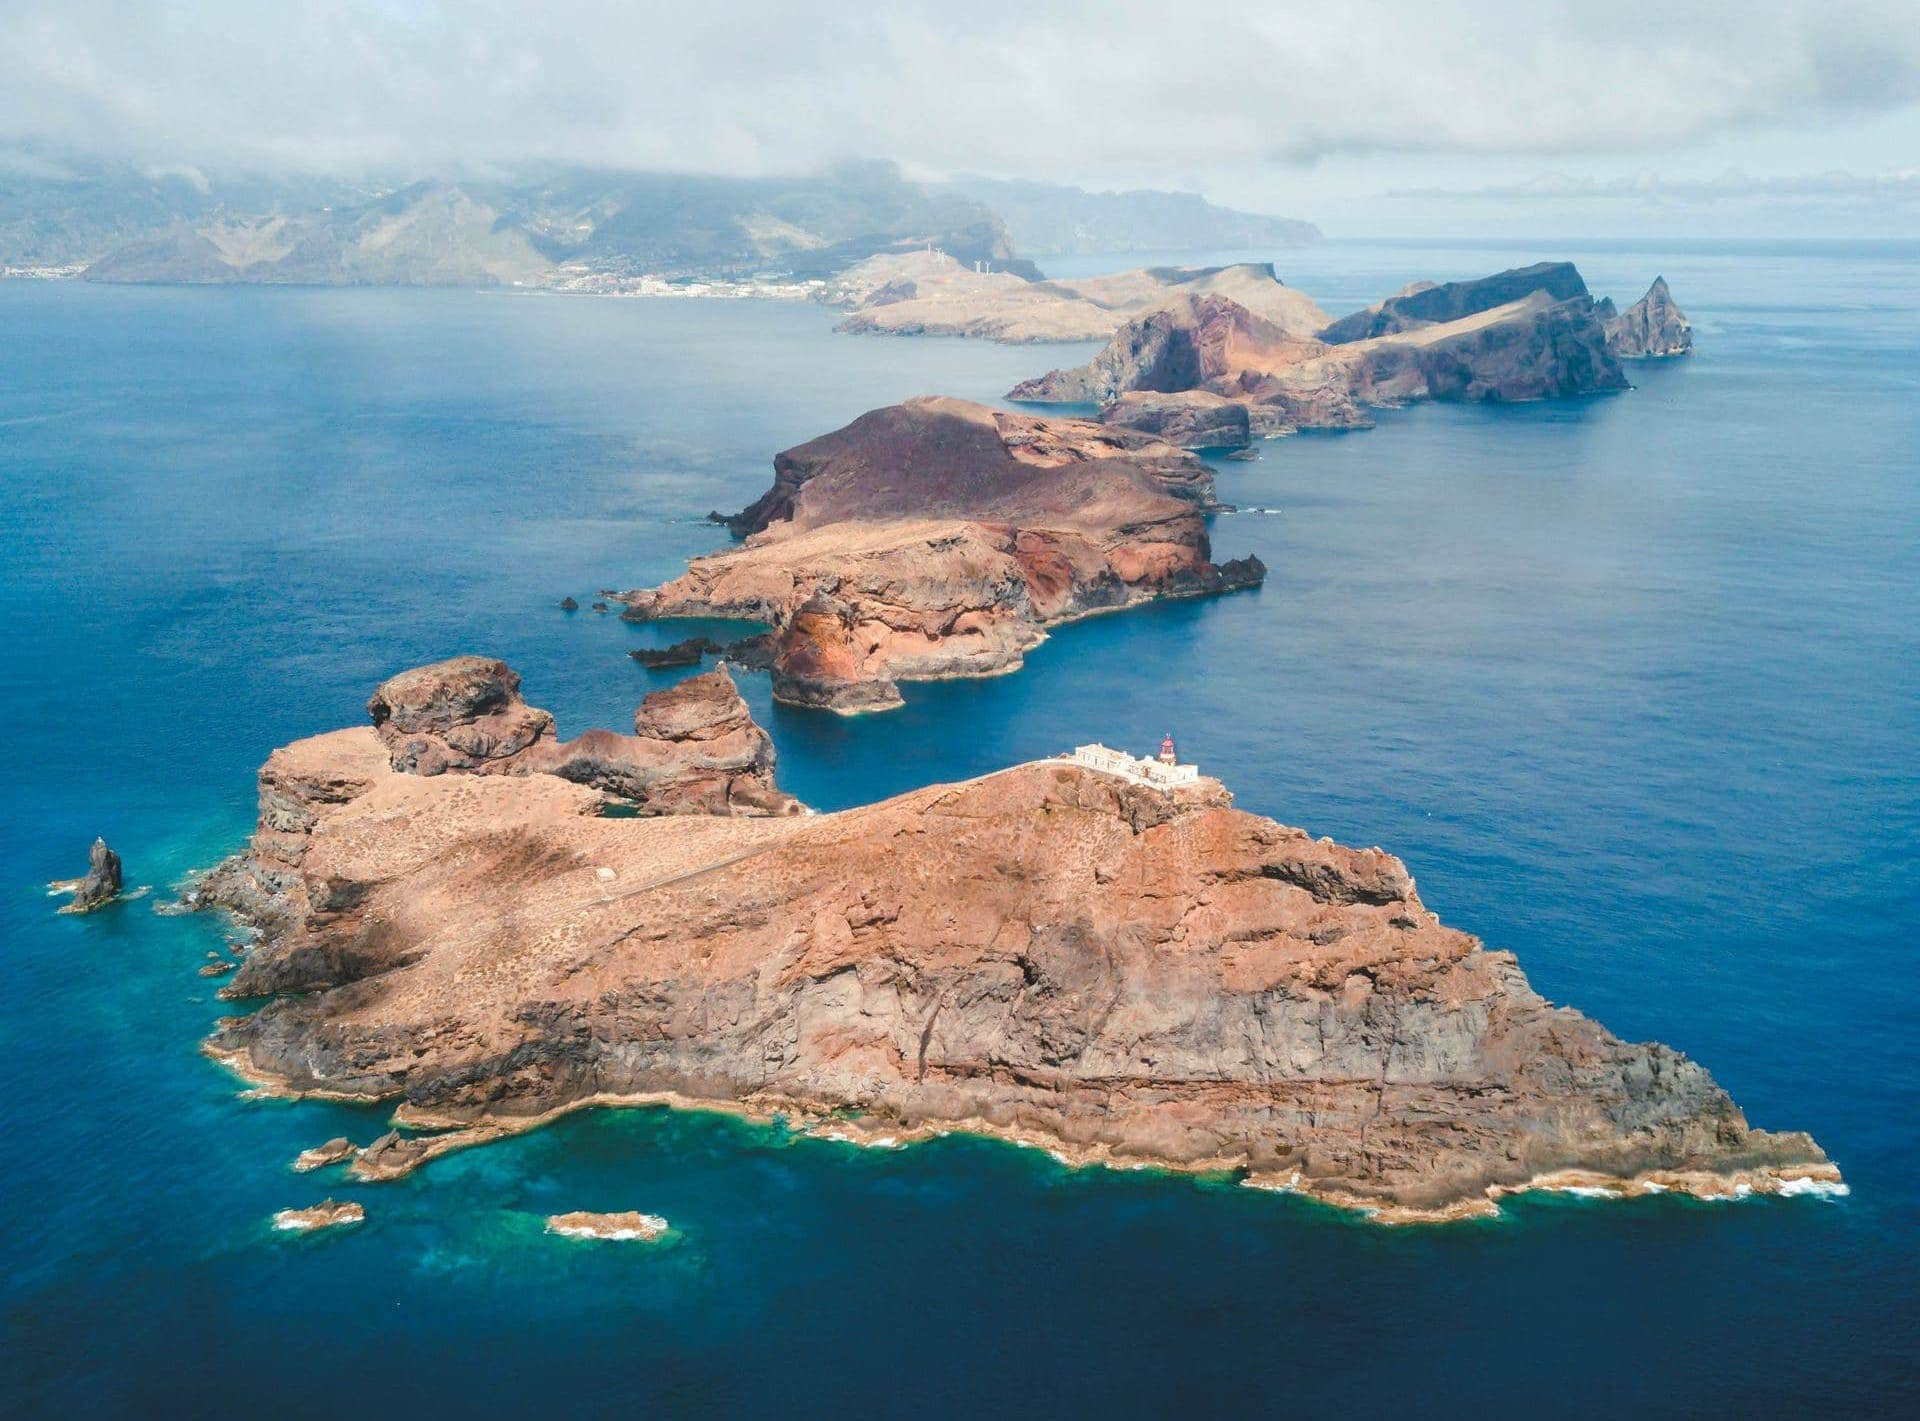 Sao Tome Island Image Global Limits Ultra Marathon Location